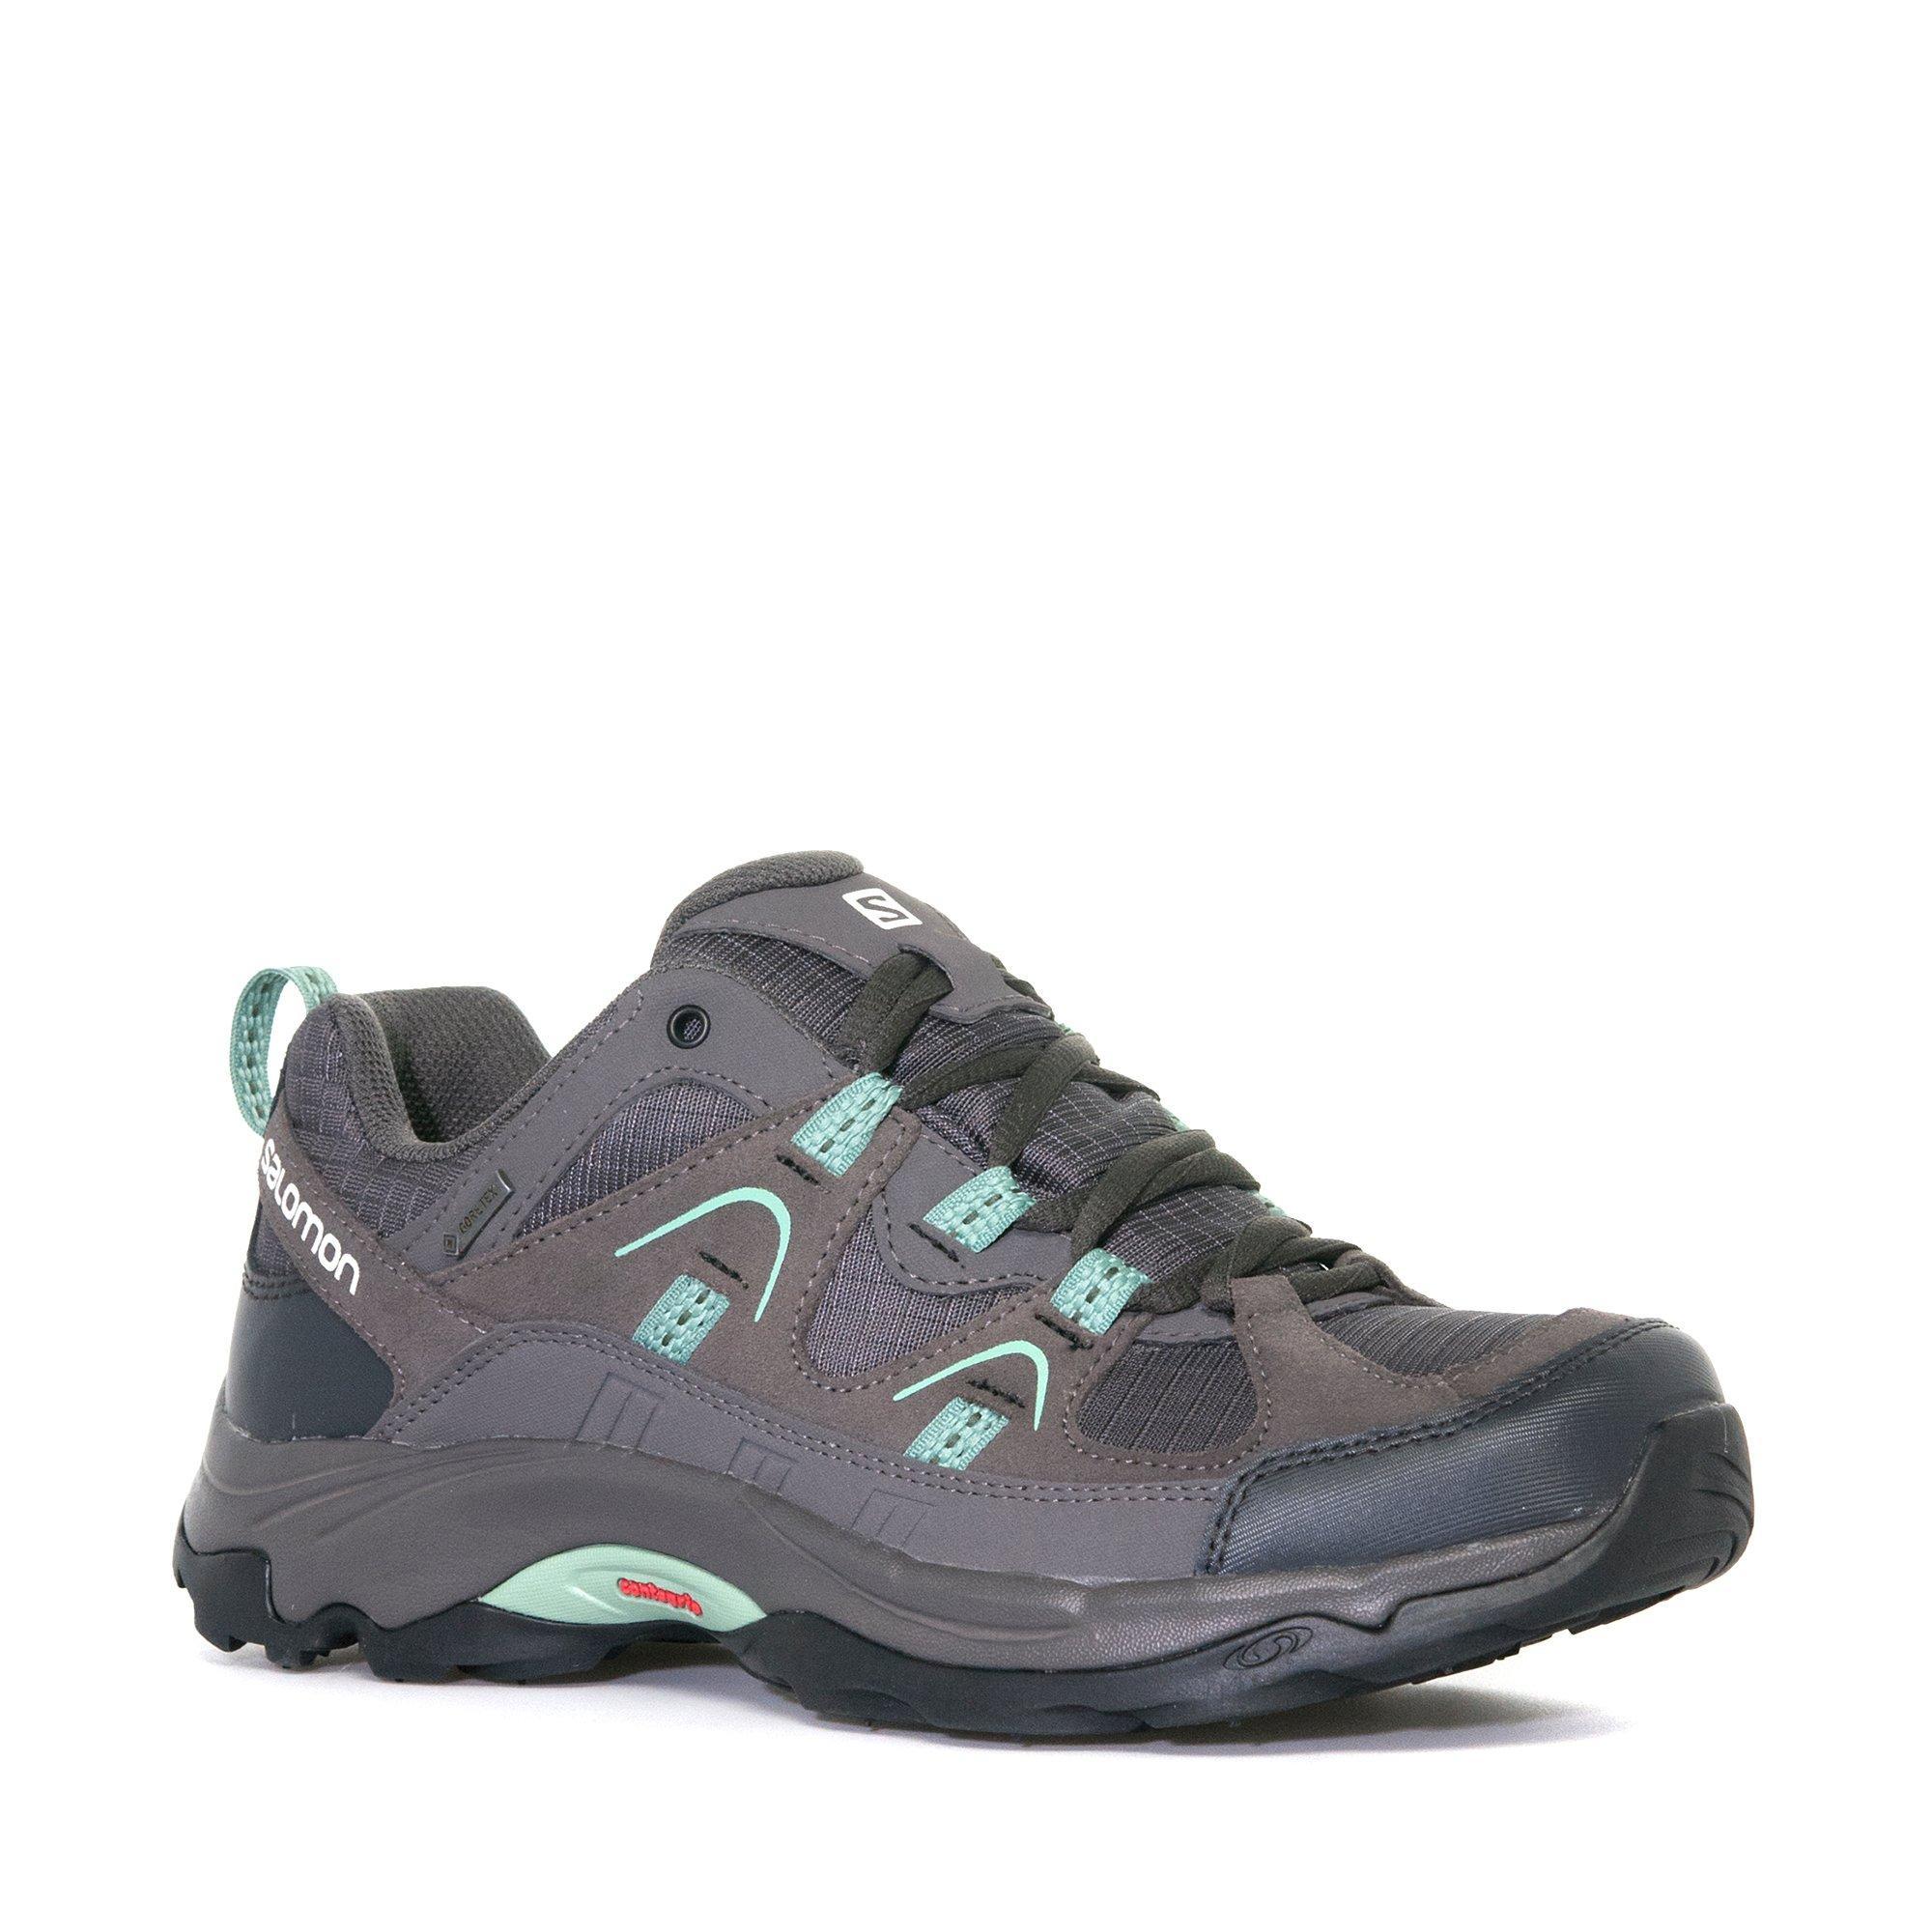 Salomon Manila Mid Gtx Hiking & Trekking Shoes For Women